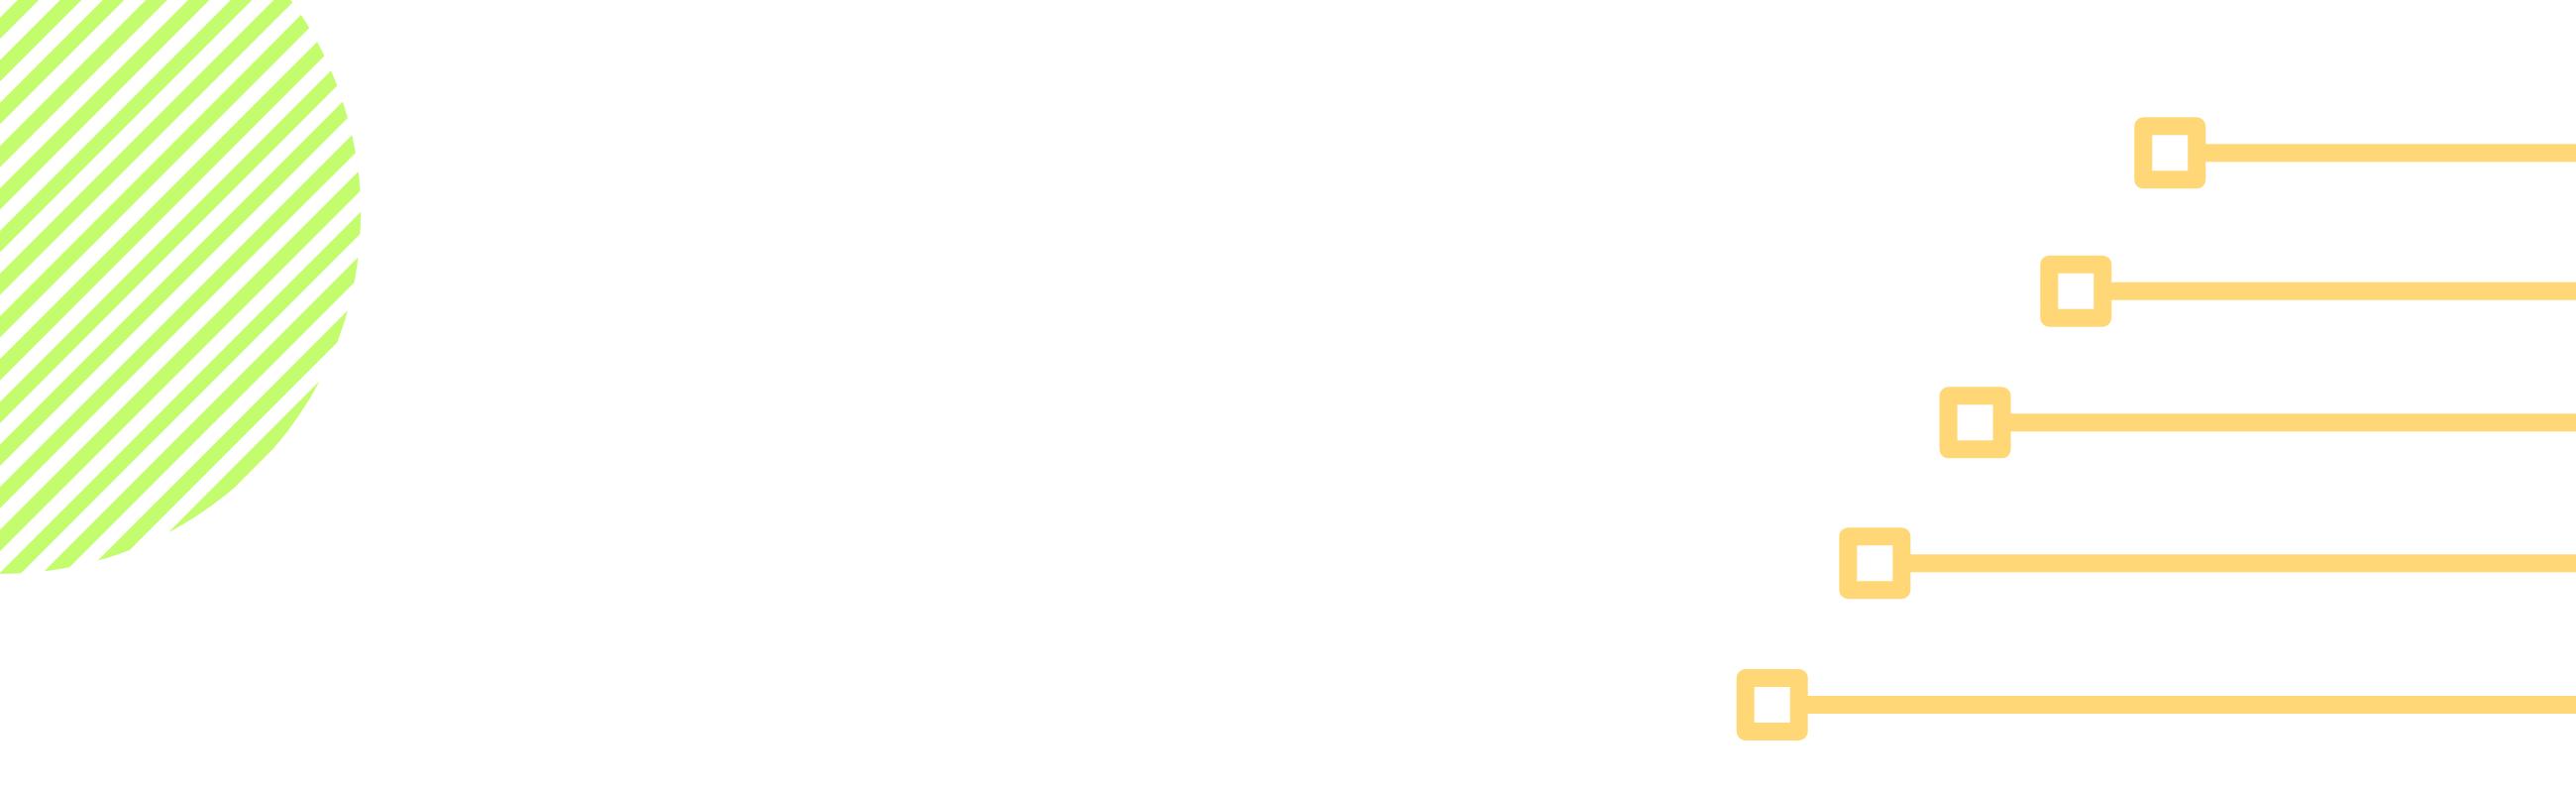 ОЛИМПИАДА «Я — БАКАЛАВР»